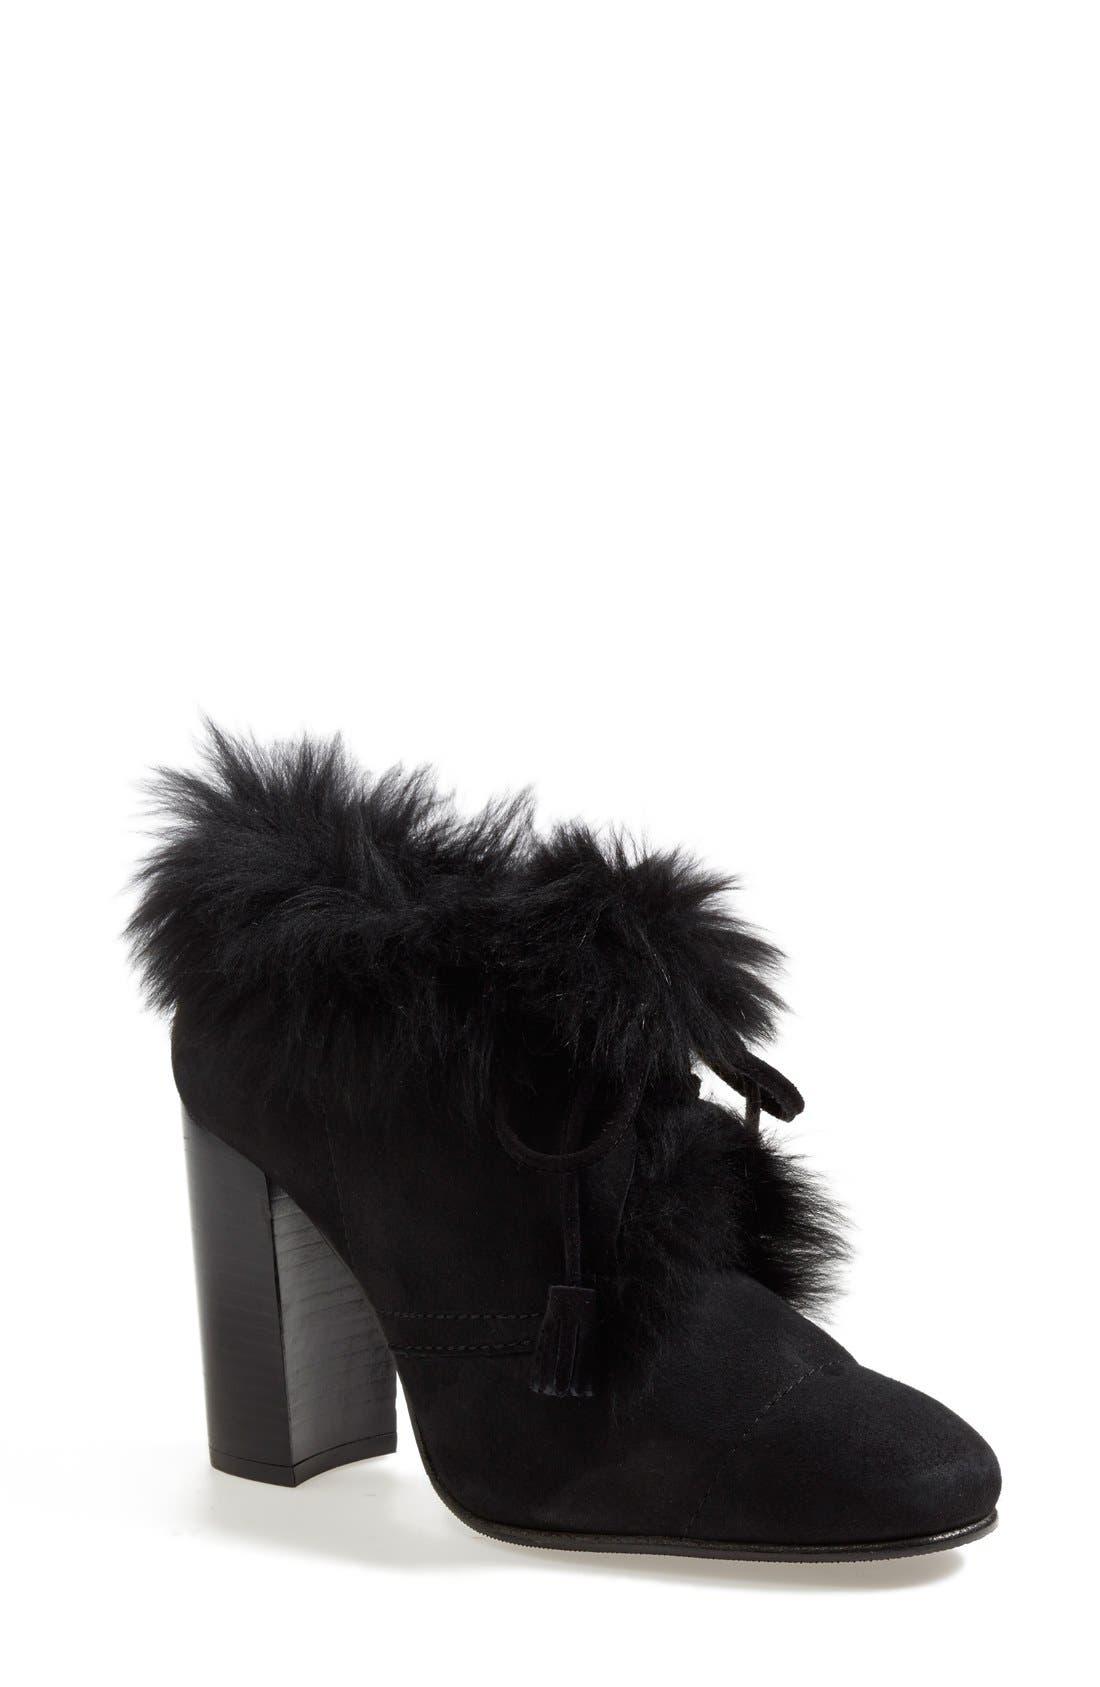 Alternate Image 1 Selected - Pedro Garcia 'Barbara' Genuine Shearling & Leather Bootie (Women)